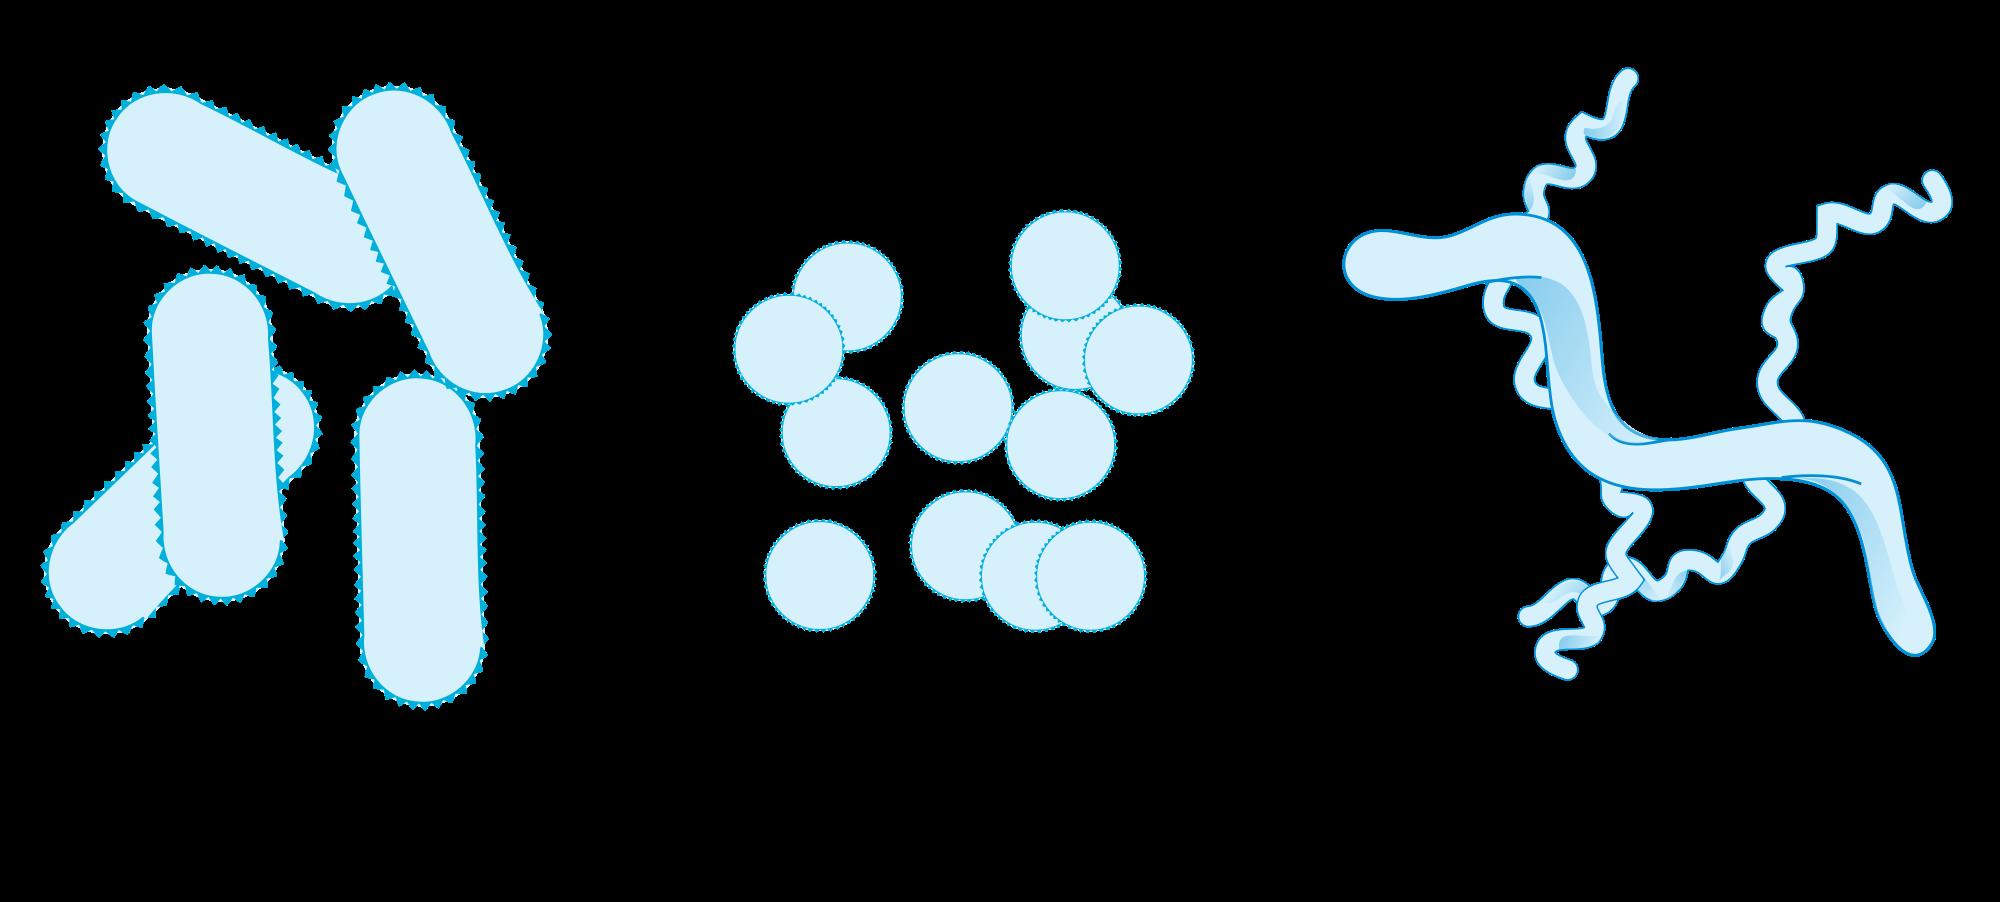 Bacteria svg #13, Download drawings